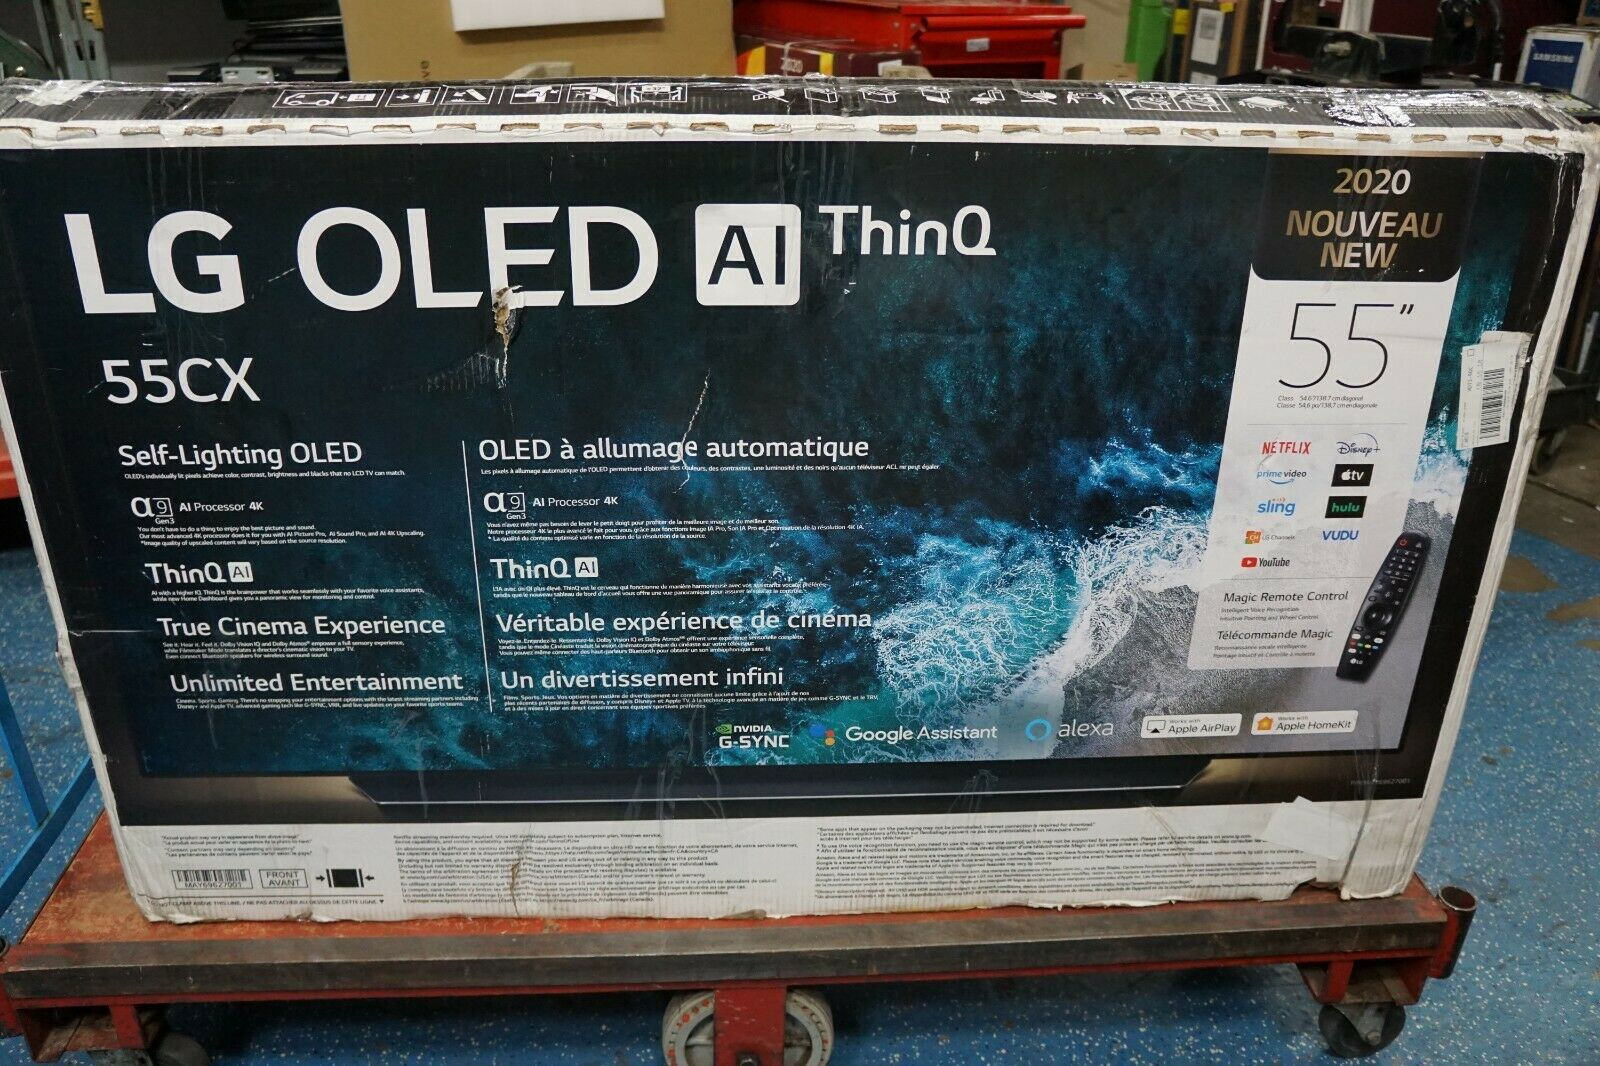 LG OLED55CXPUA Class OLED 4K UHD CX Series Smart TV --- //LOCAL PICKUP!// **. Buy it now for 1549.99